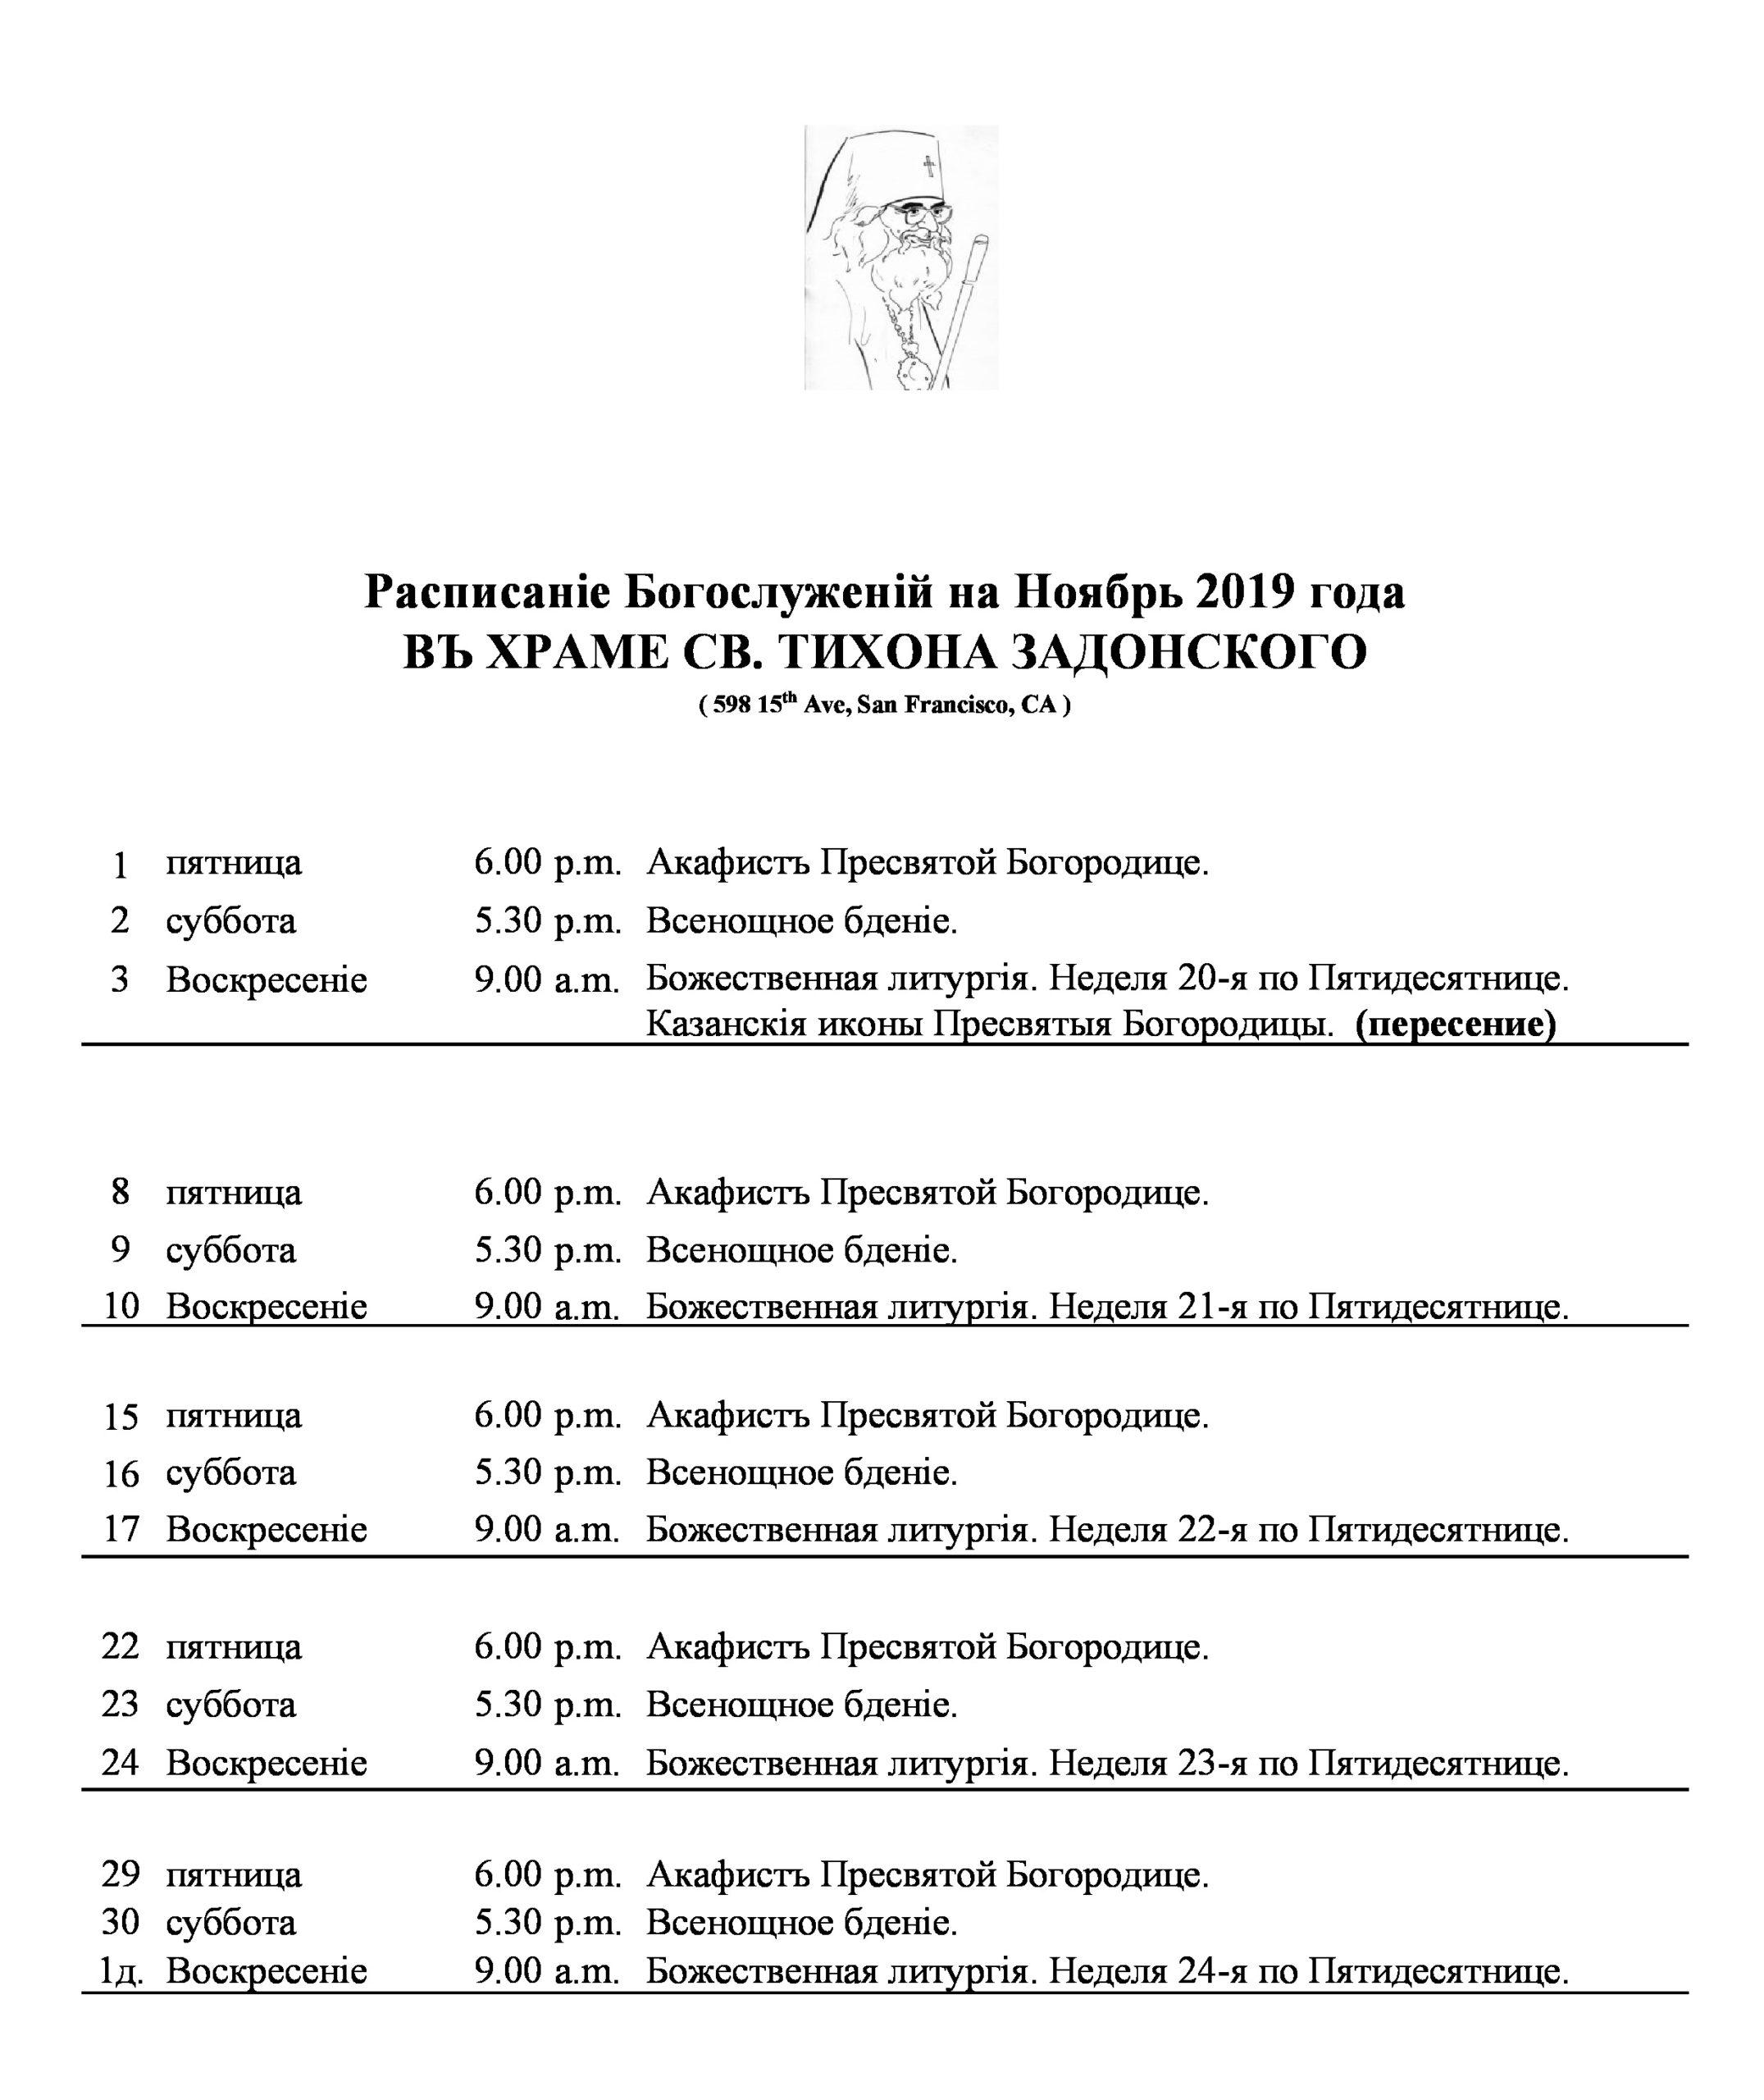 schedule_november_2019